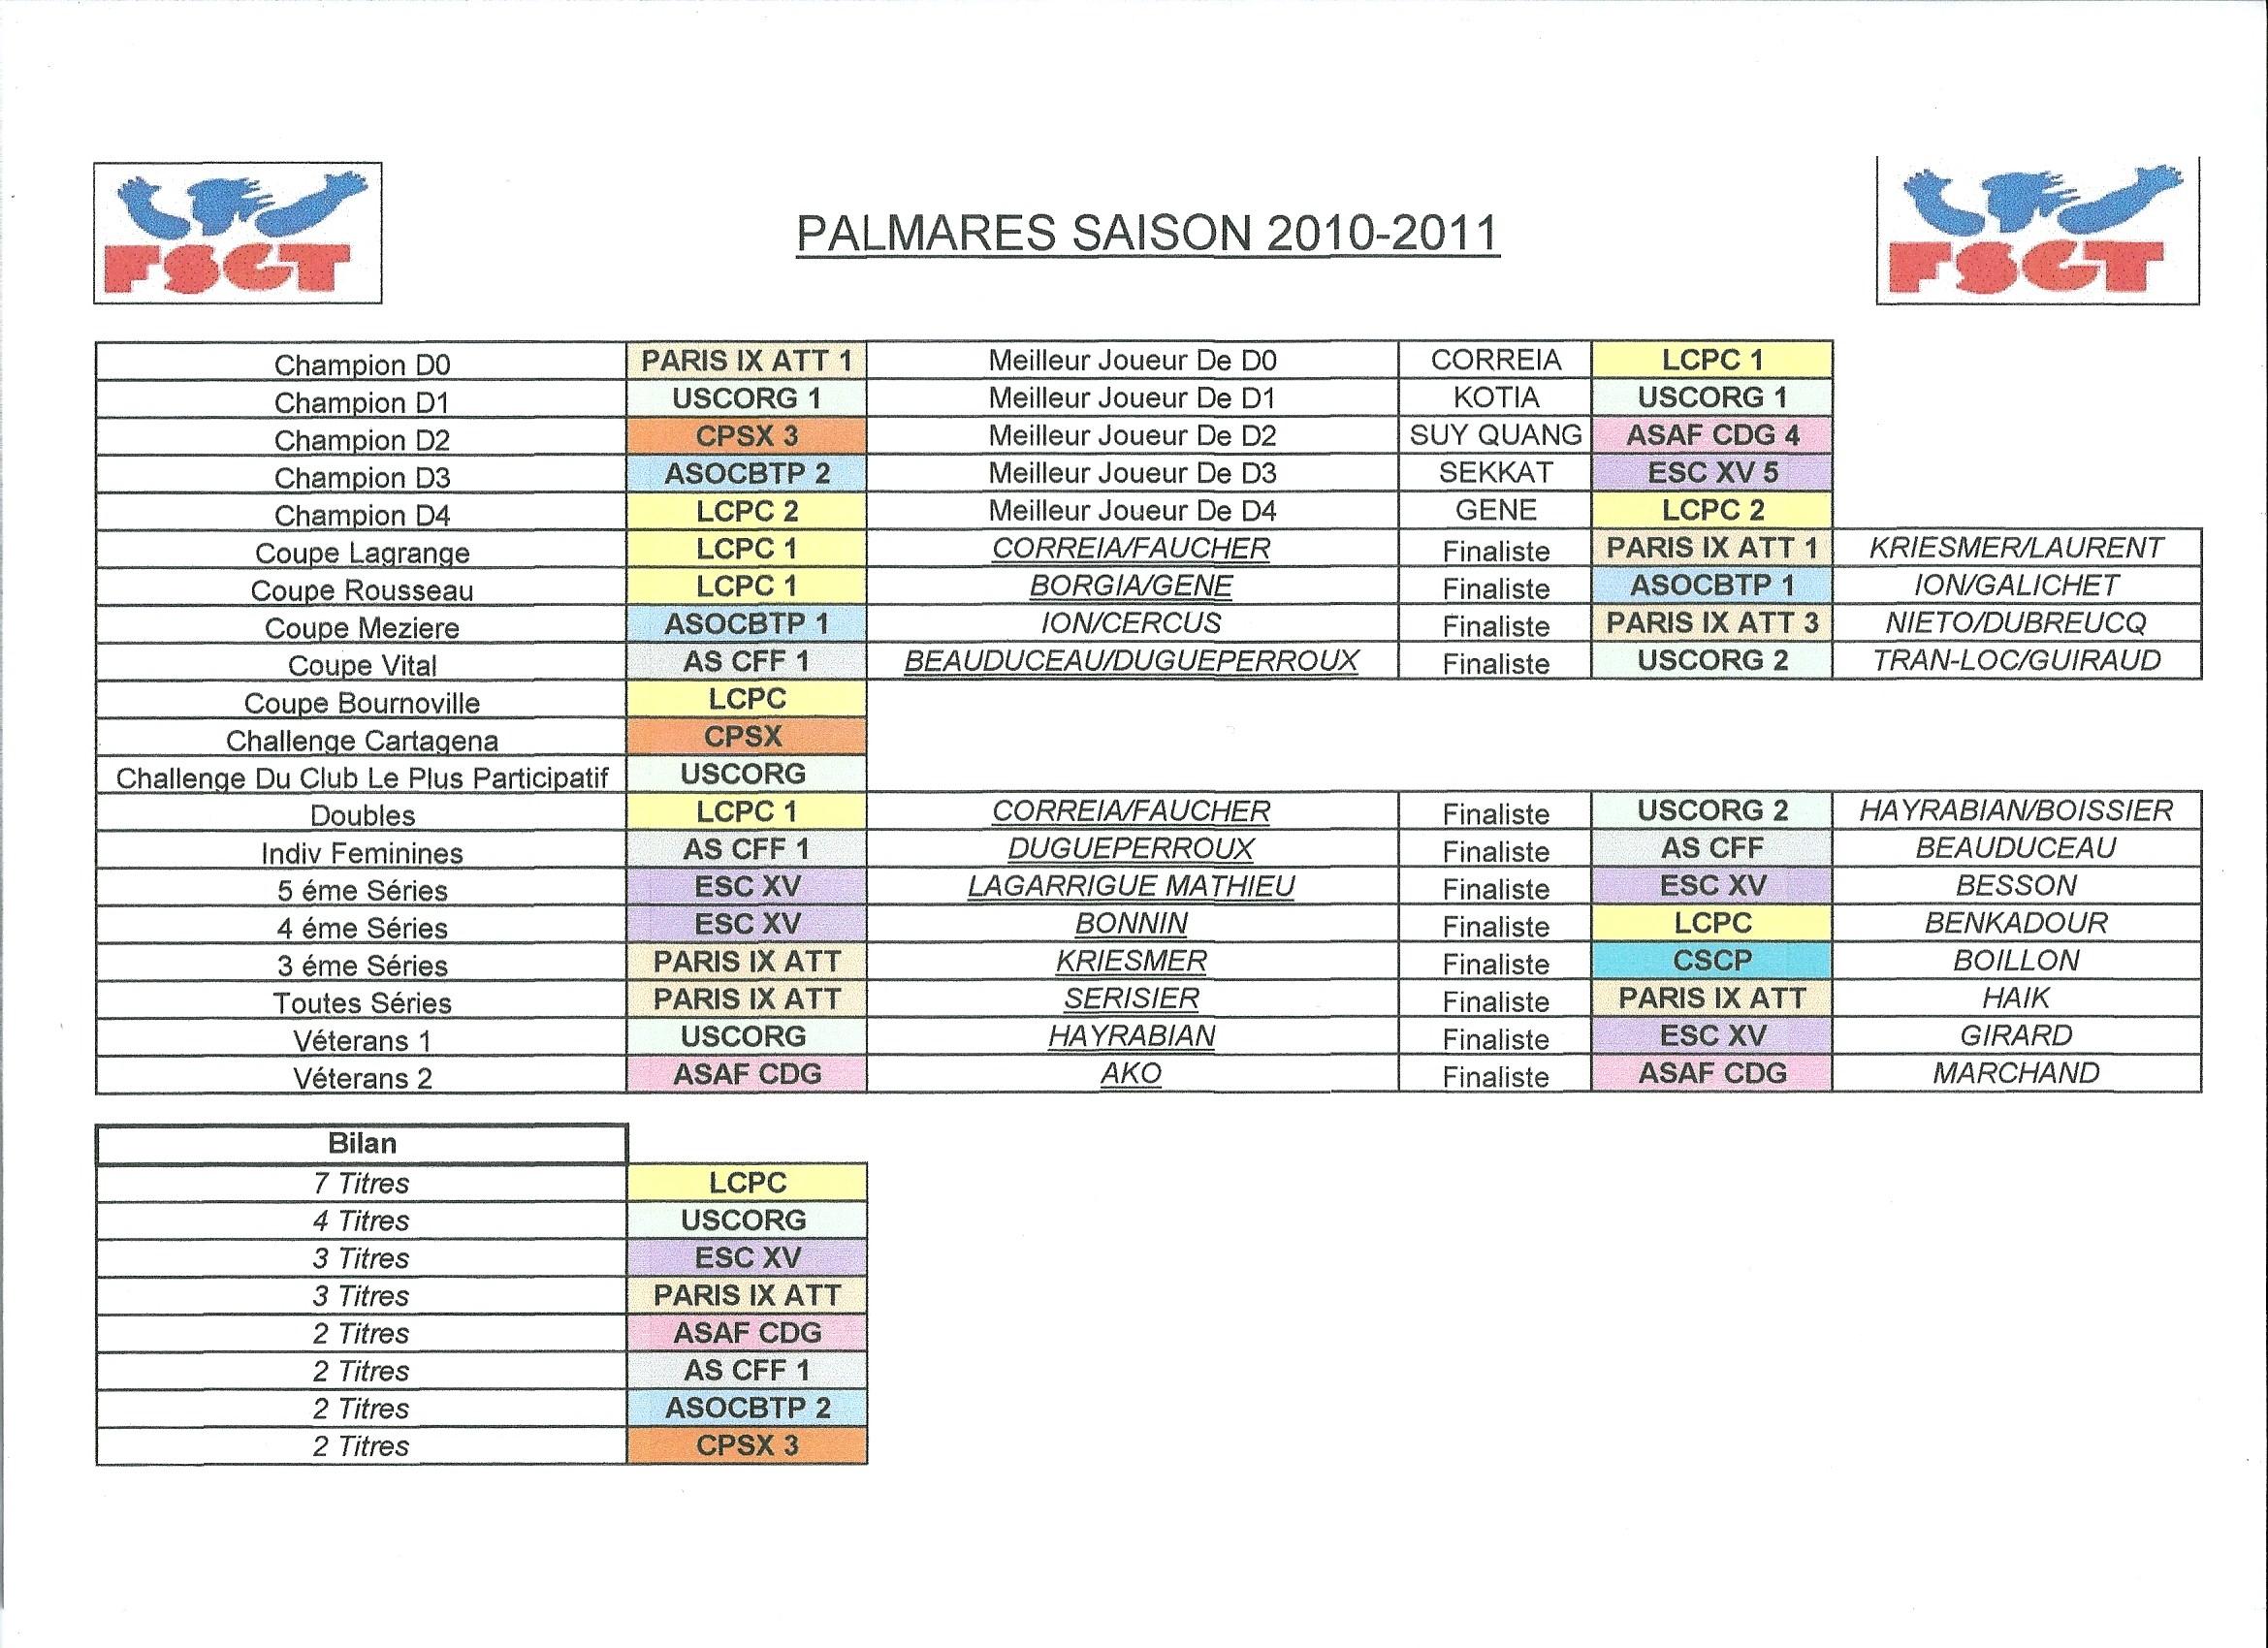 Palmarès 2010-2011